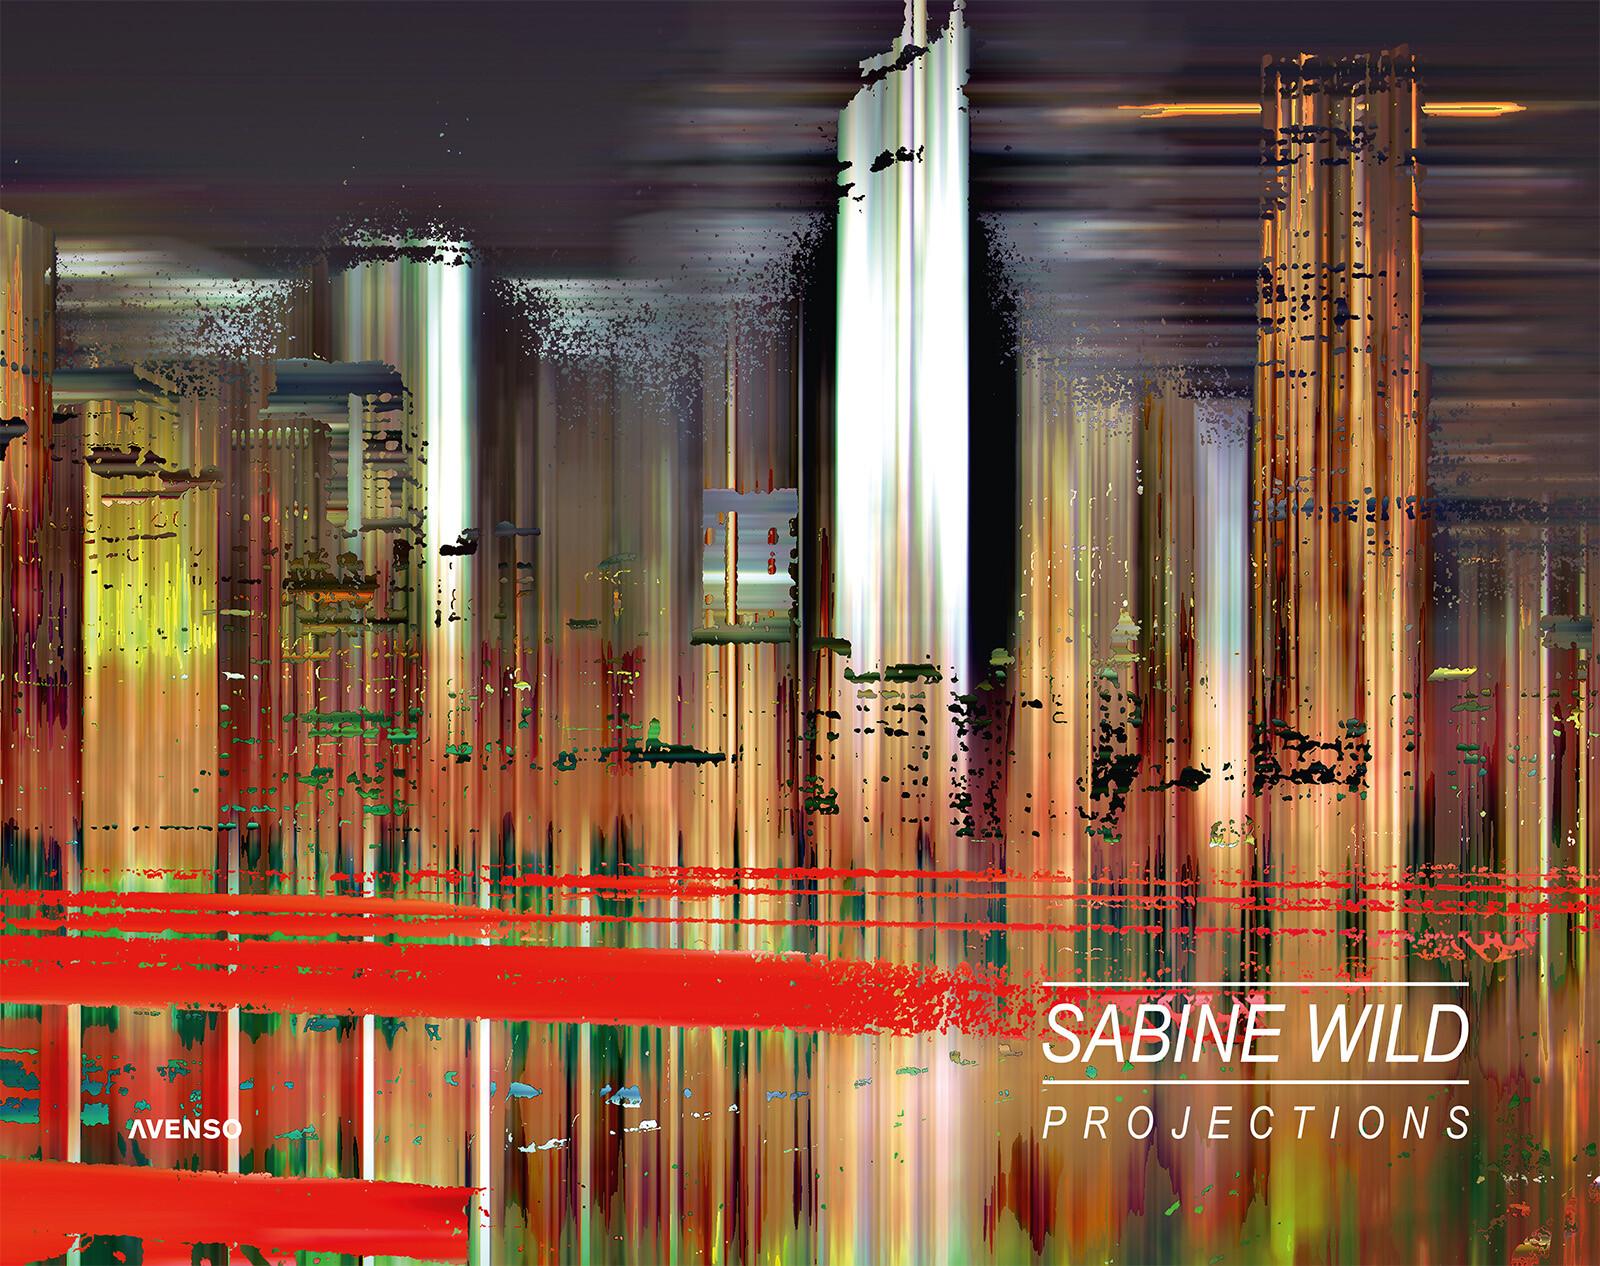 Sabine Wild - Projections - Sabine Wild